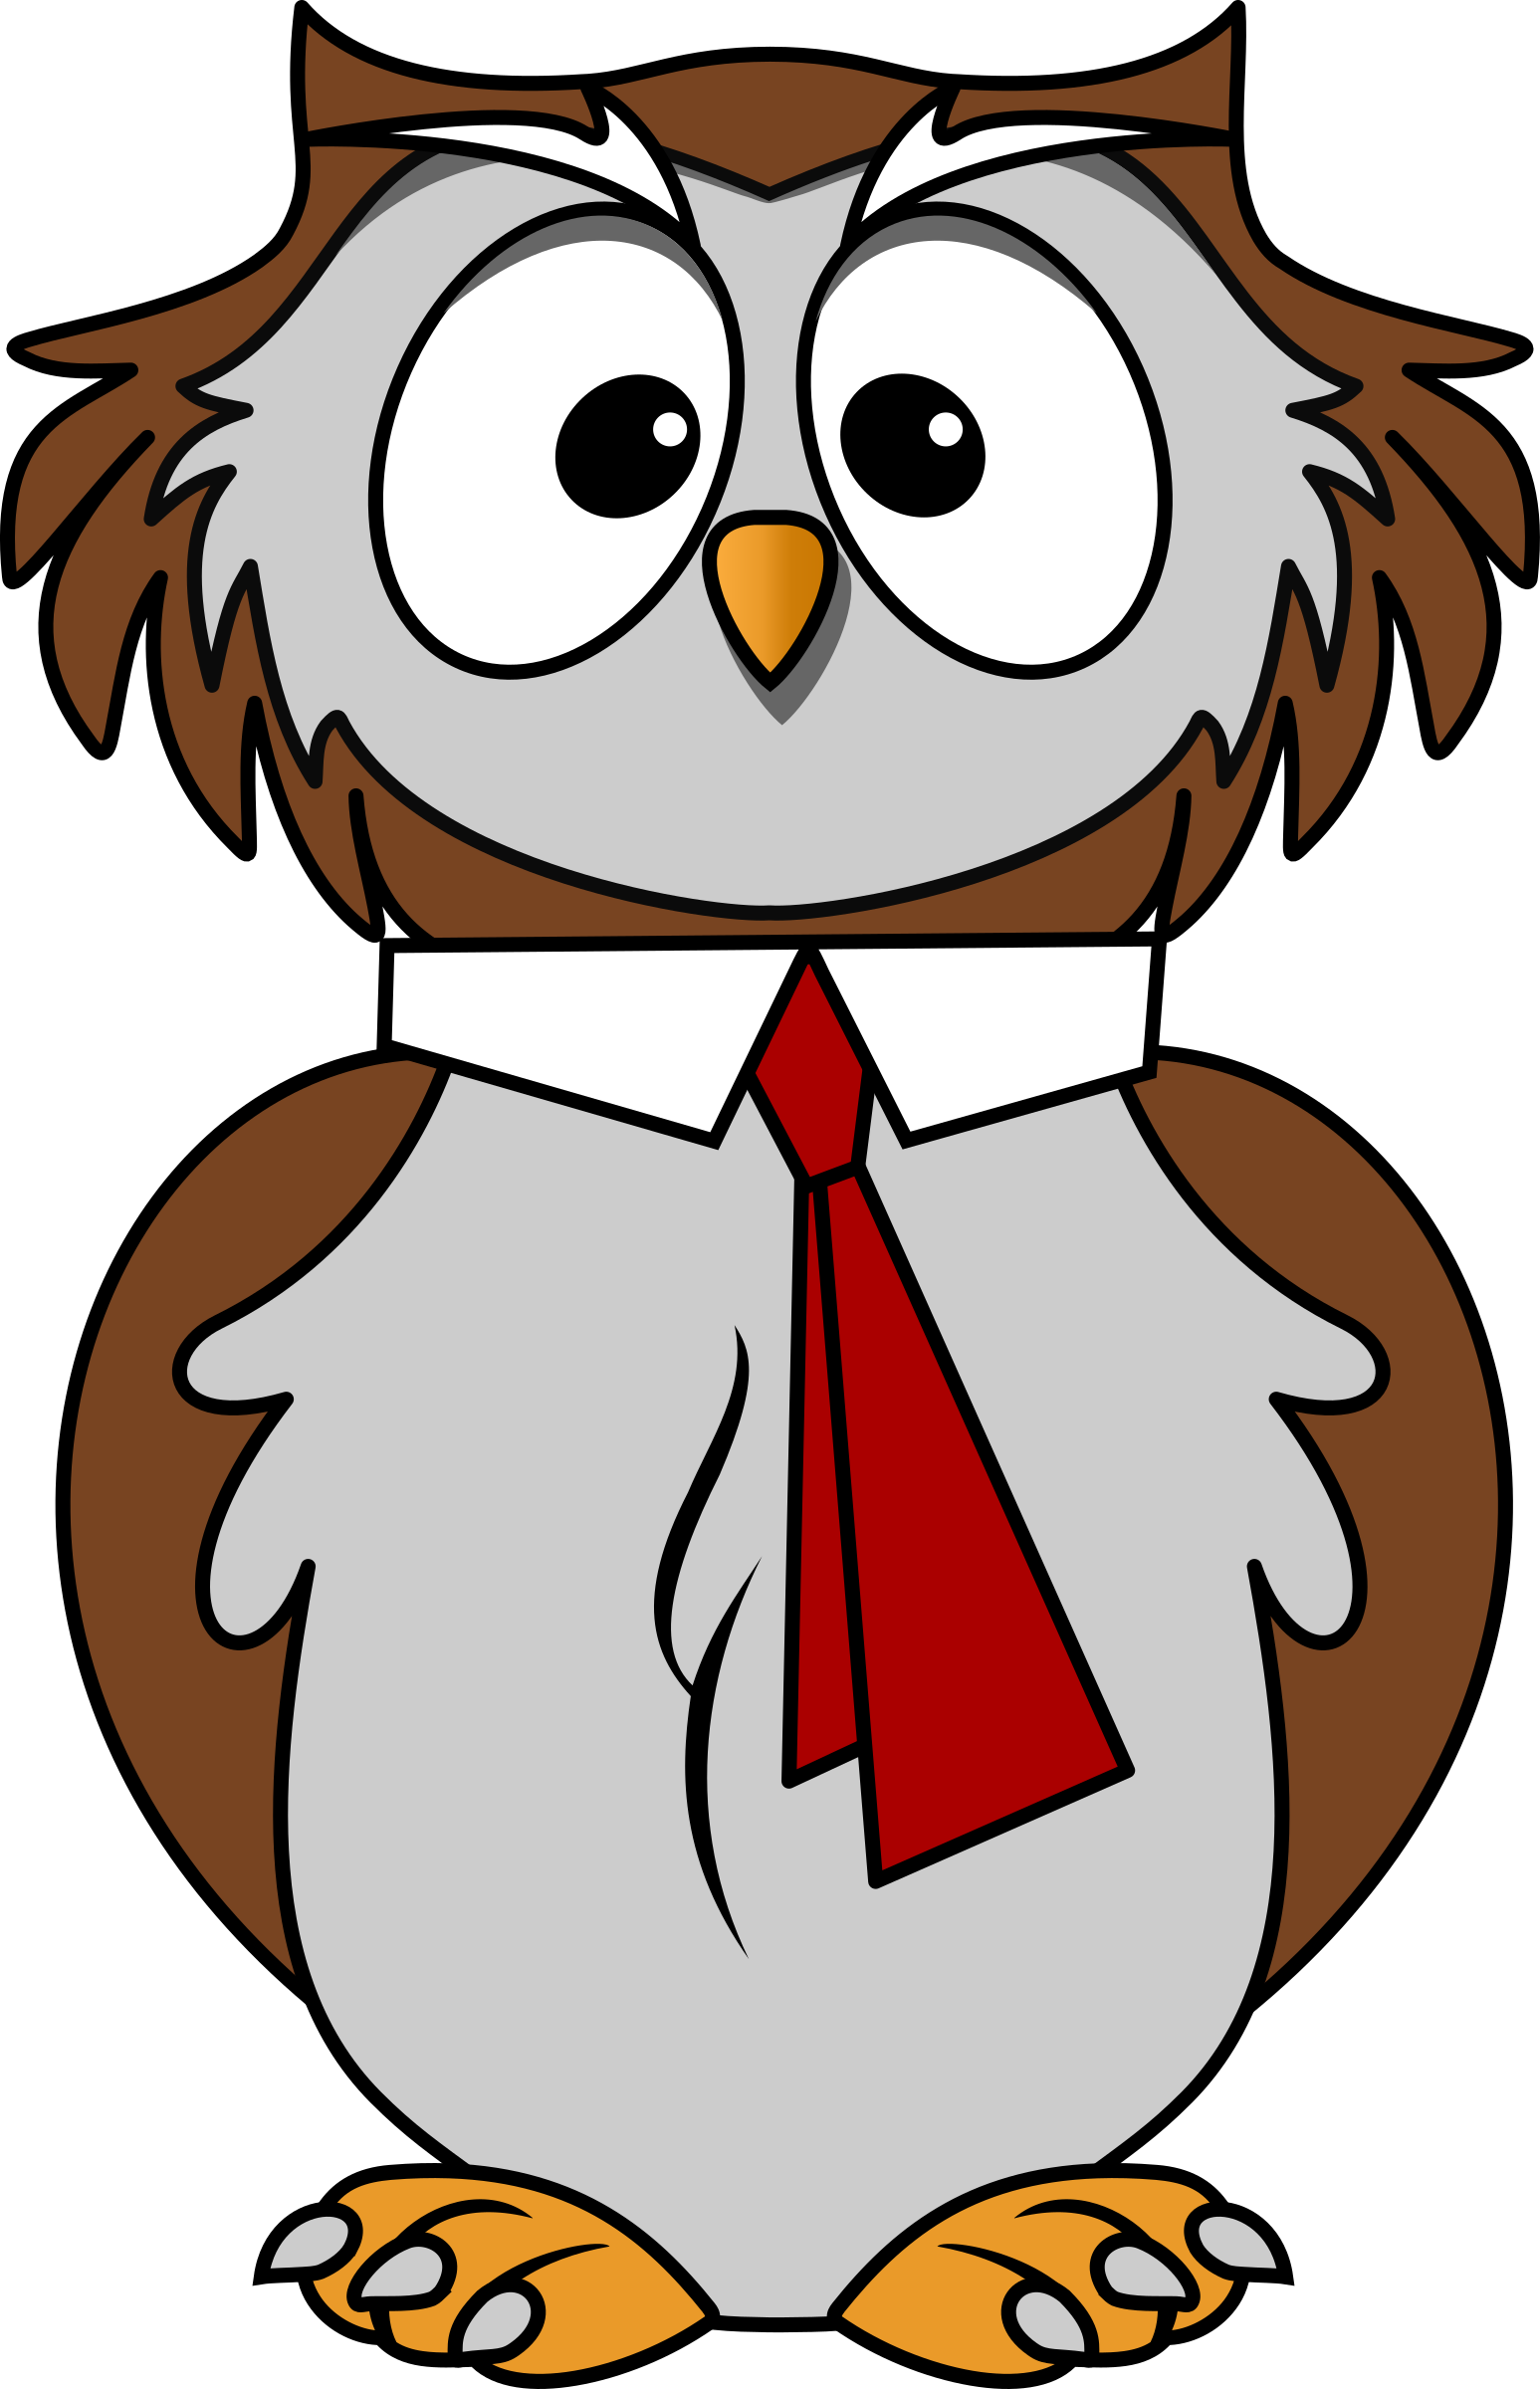 Owls clipart school. Cute owl at getdrawings